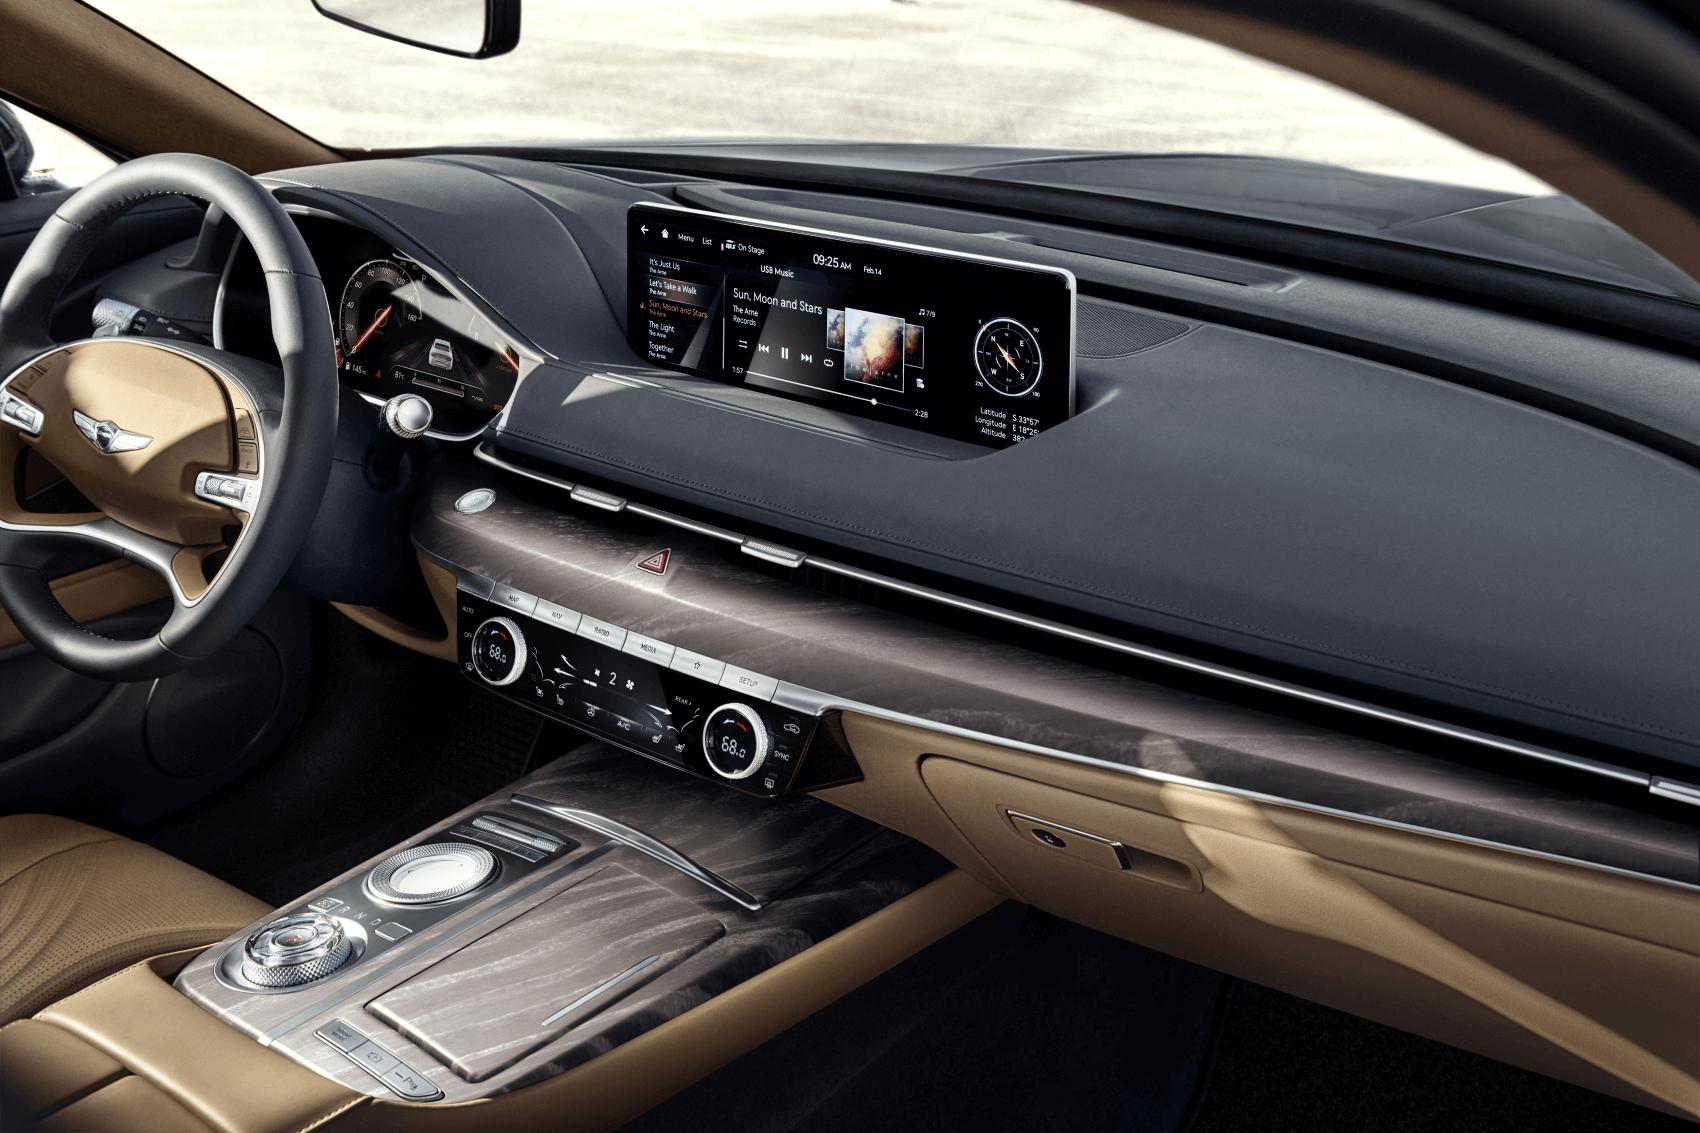 Genesis G80 Interior Tech